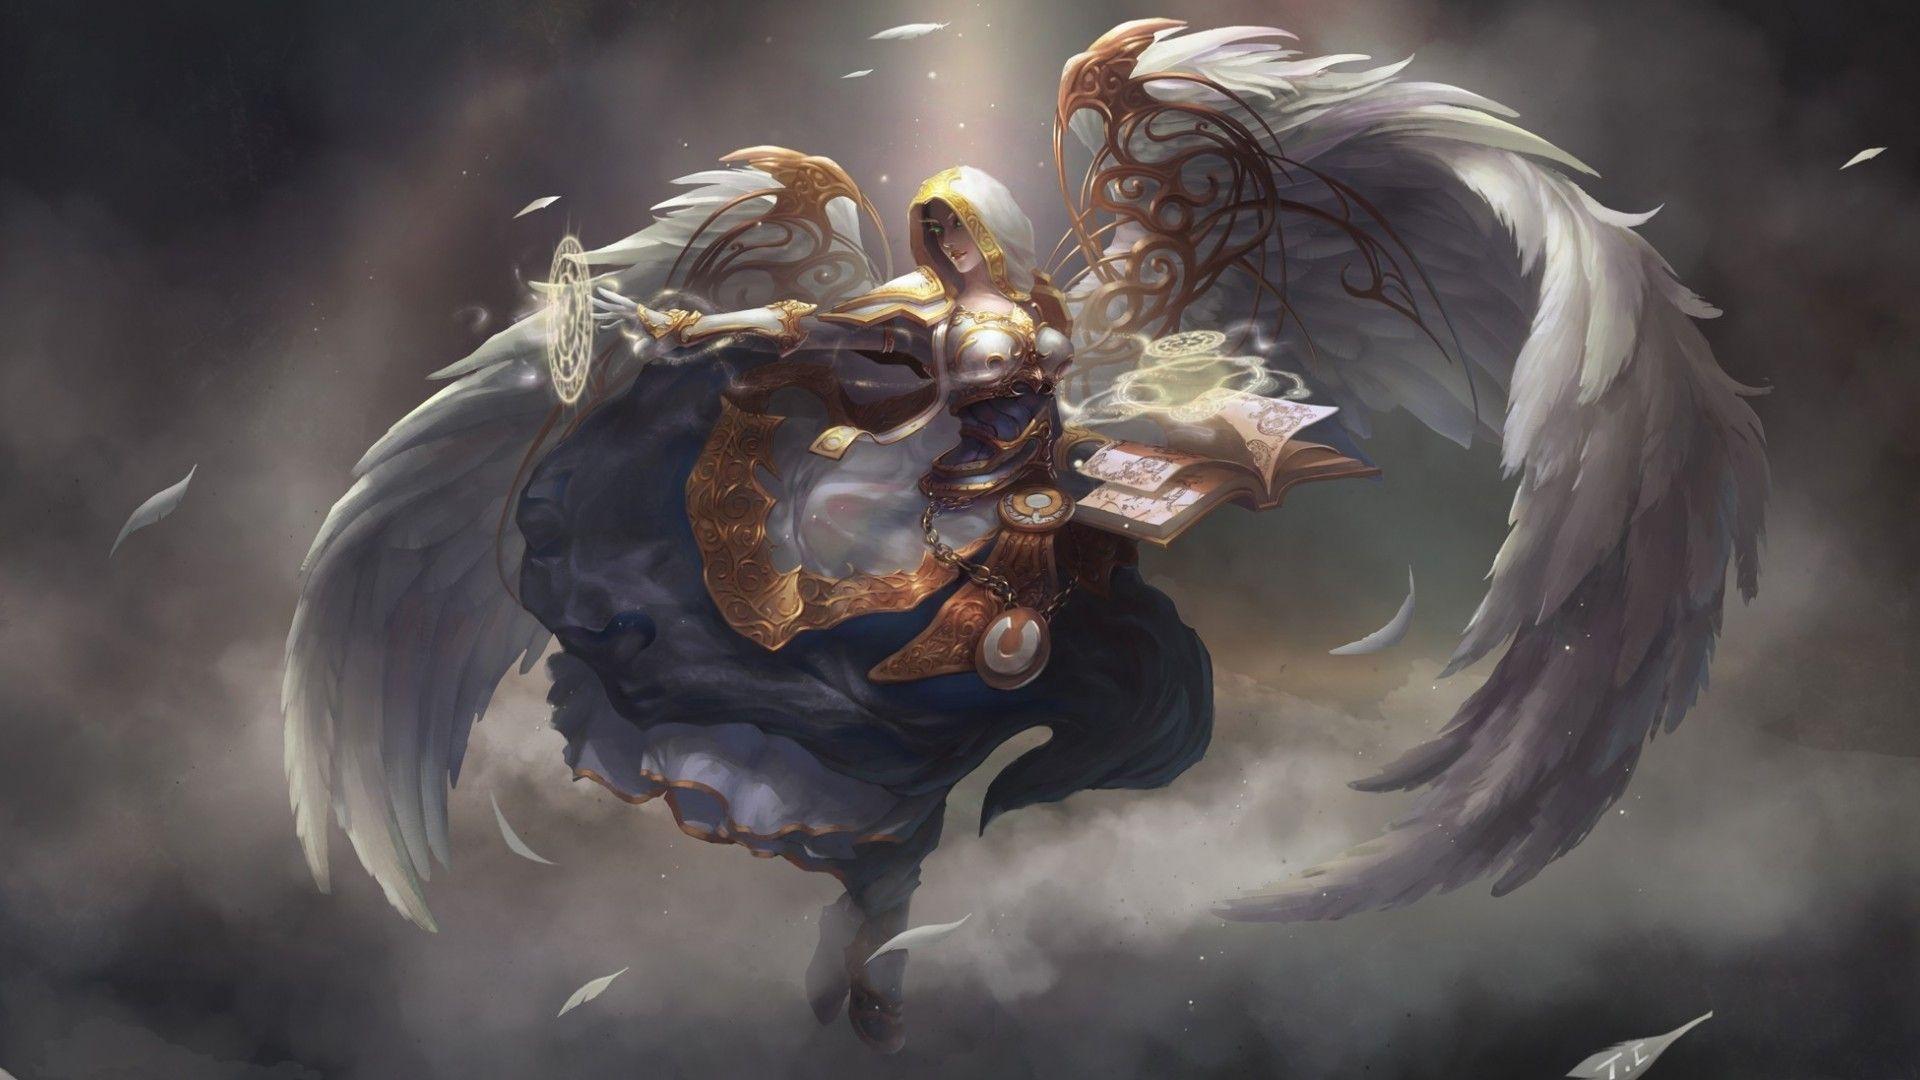 Angel Book Magic Wings Wow World Warcraft Fantasy